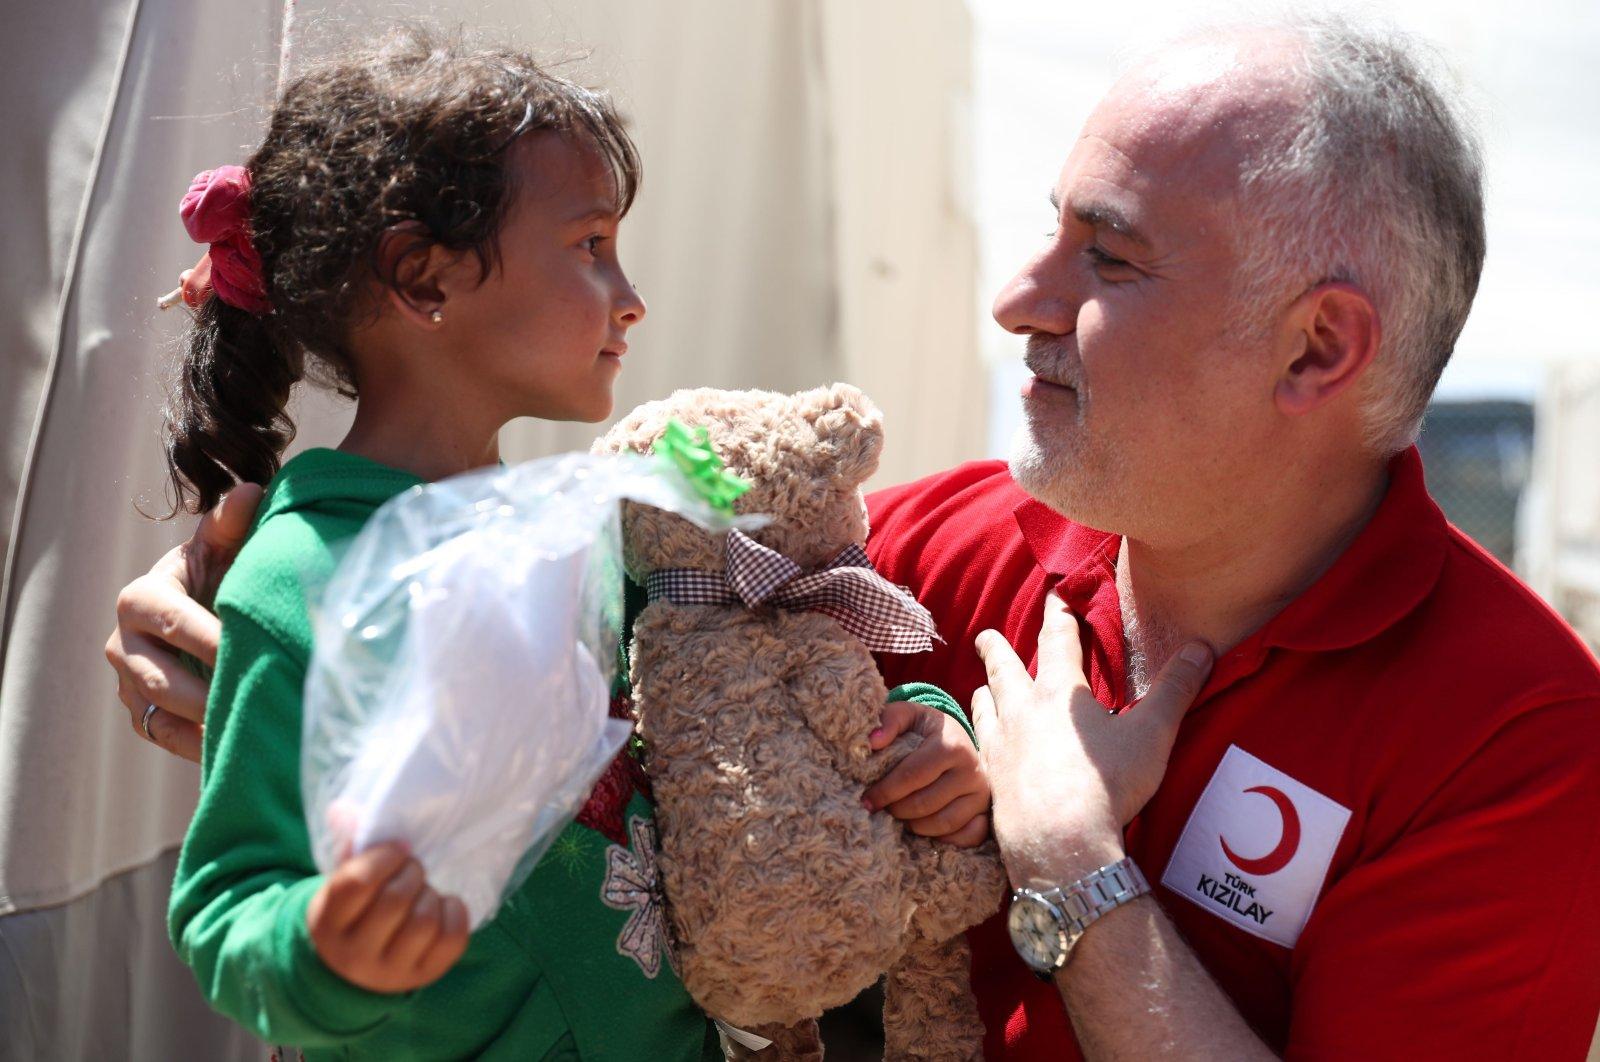 Turkish Red Crescent President Dr. Kerem Kınık delivers aid in this file photo. (Courtesy of Turkish Red Crescent)